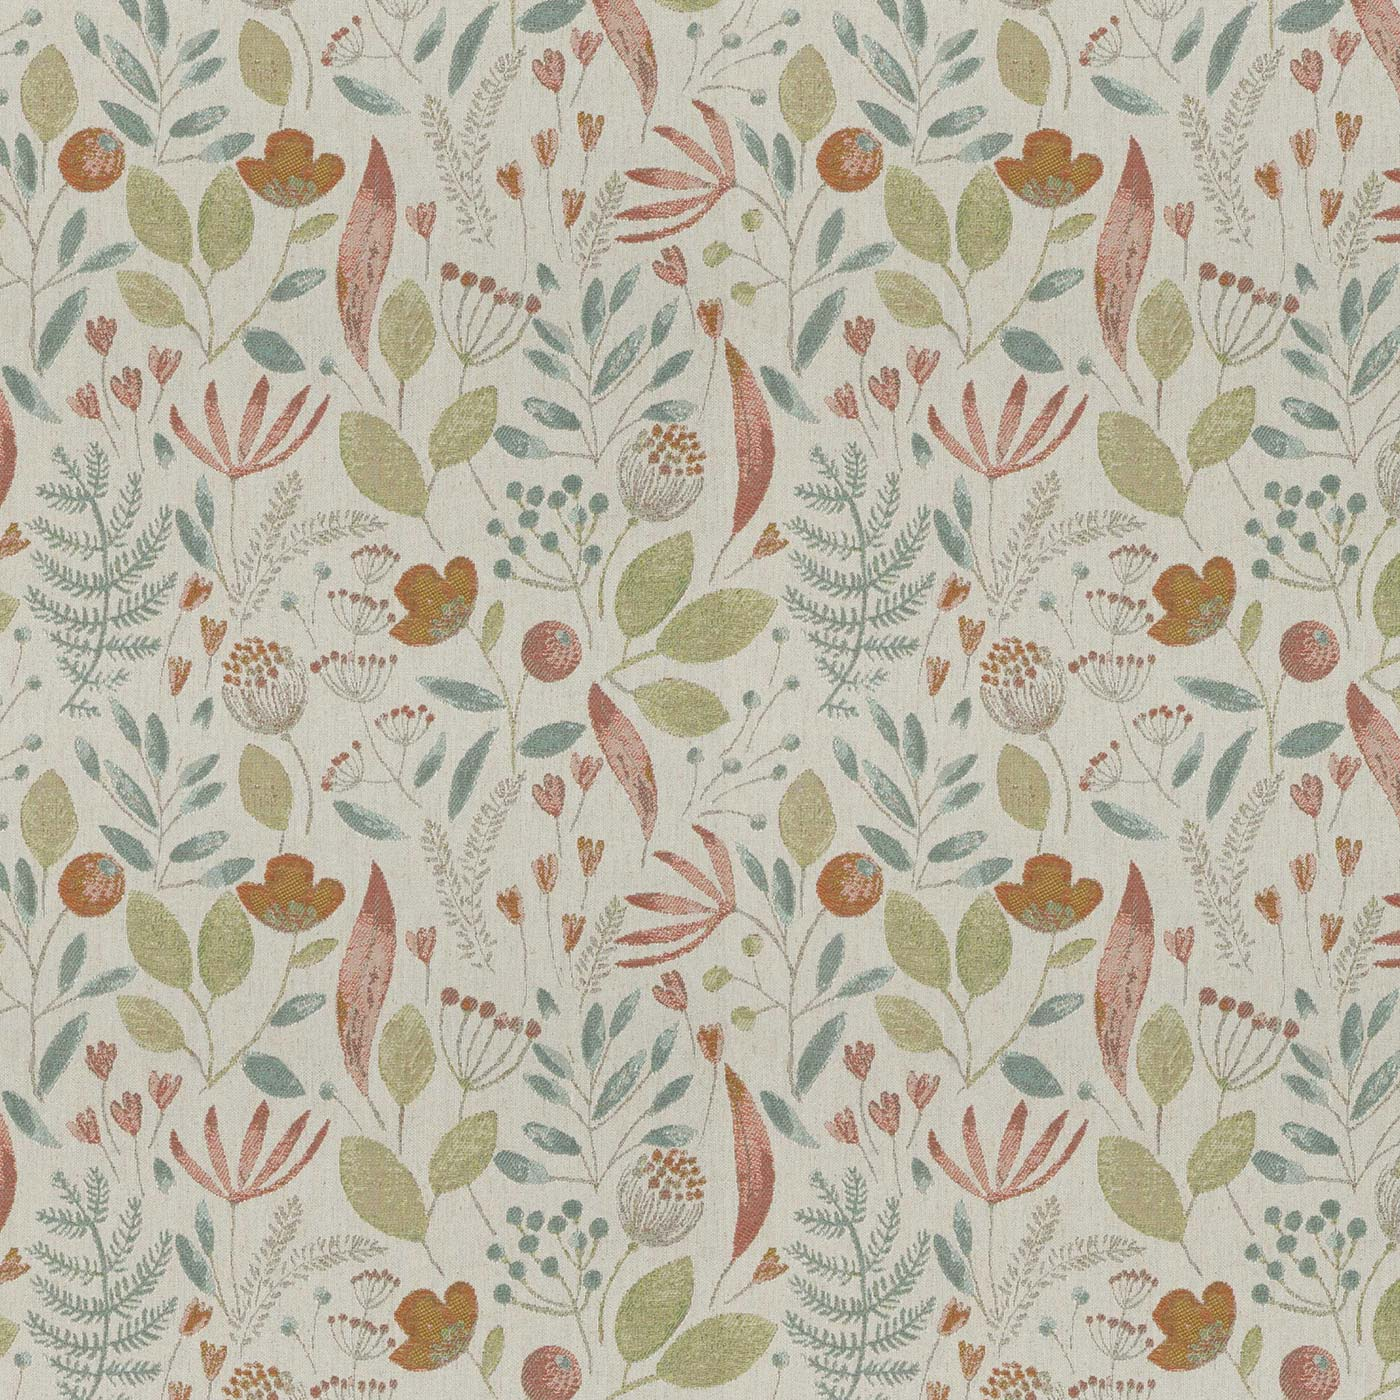 Winslow Linen Autumn